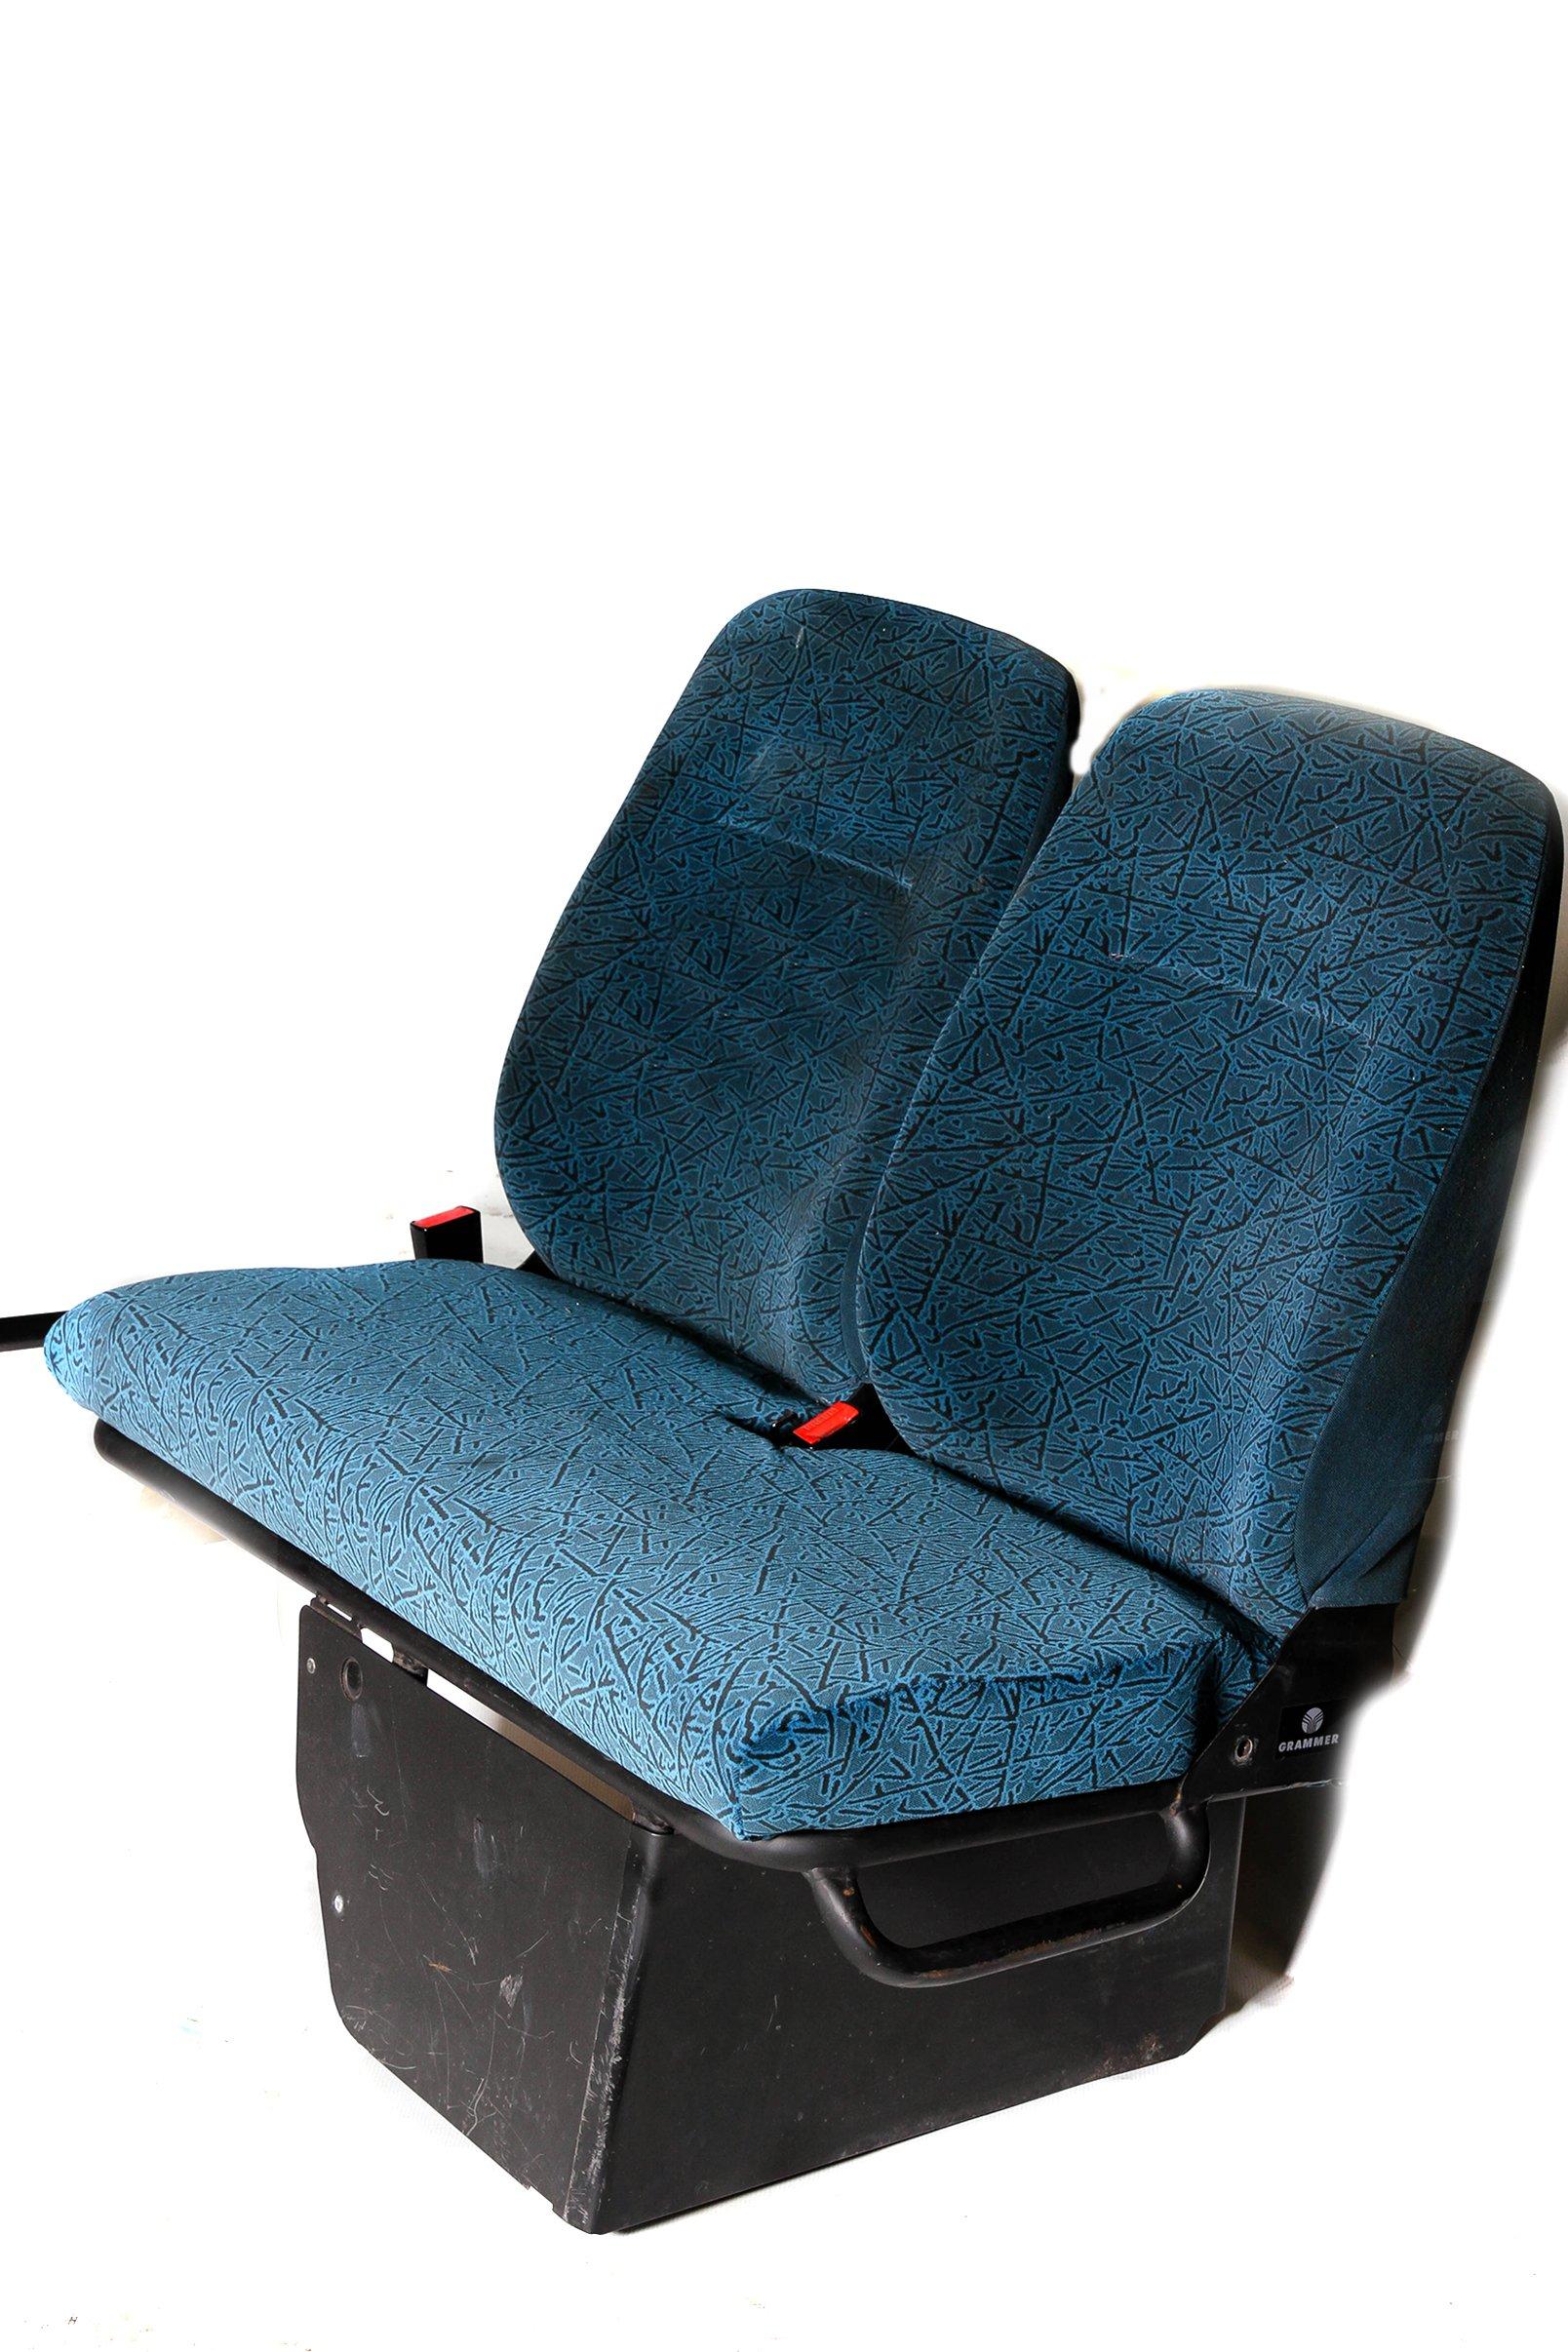 truck seat